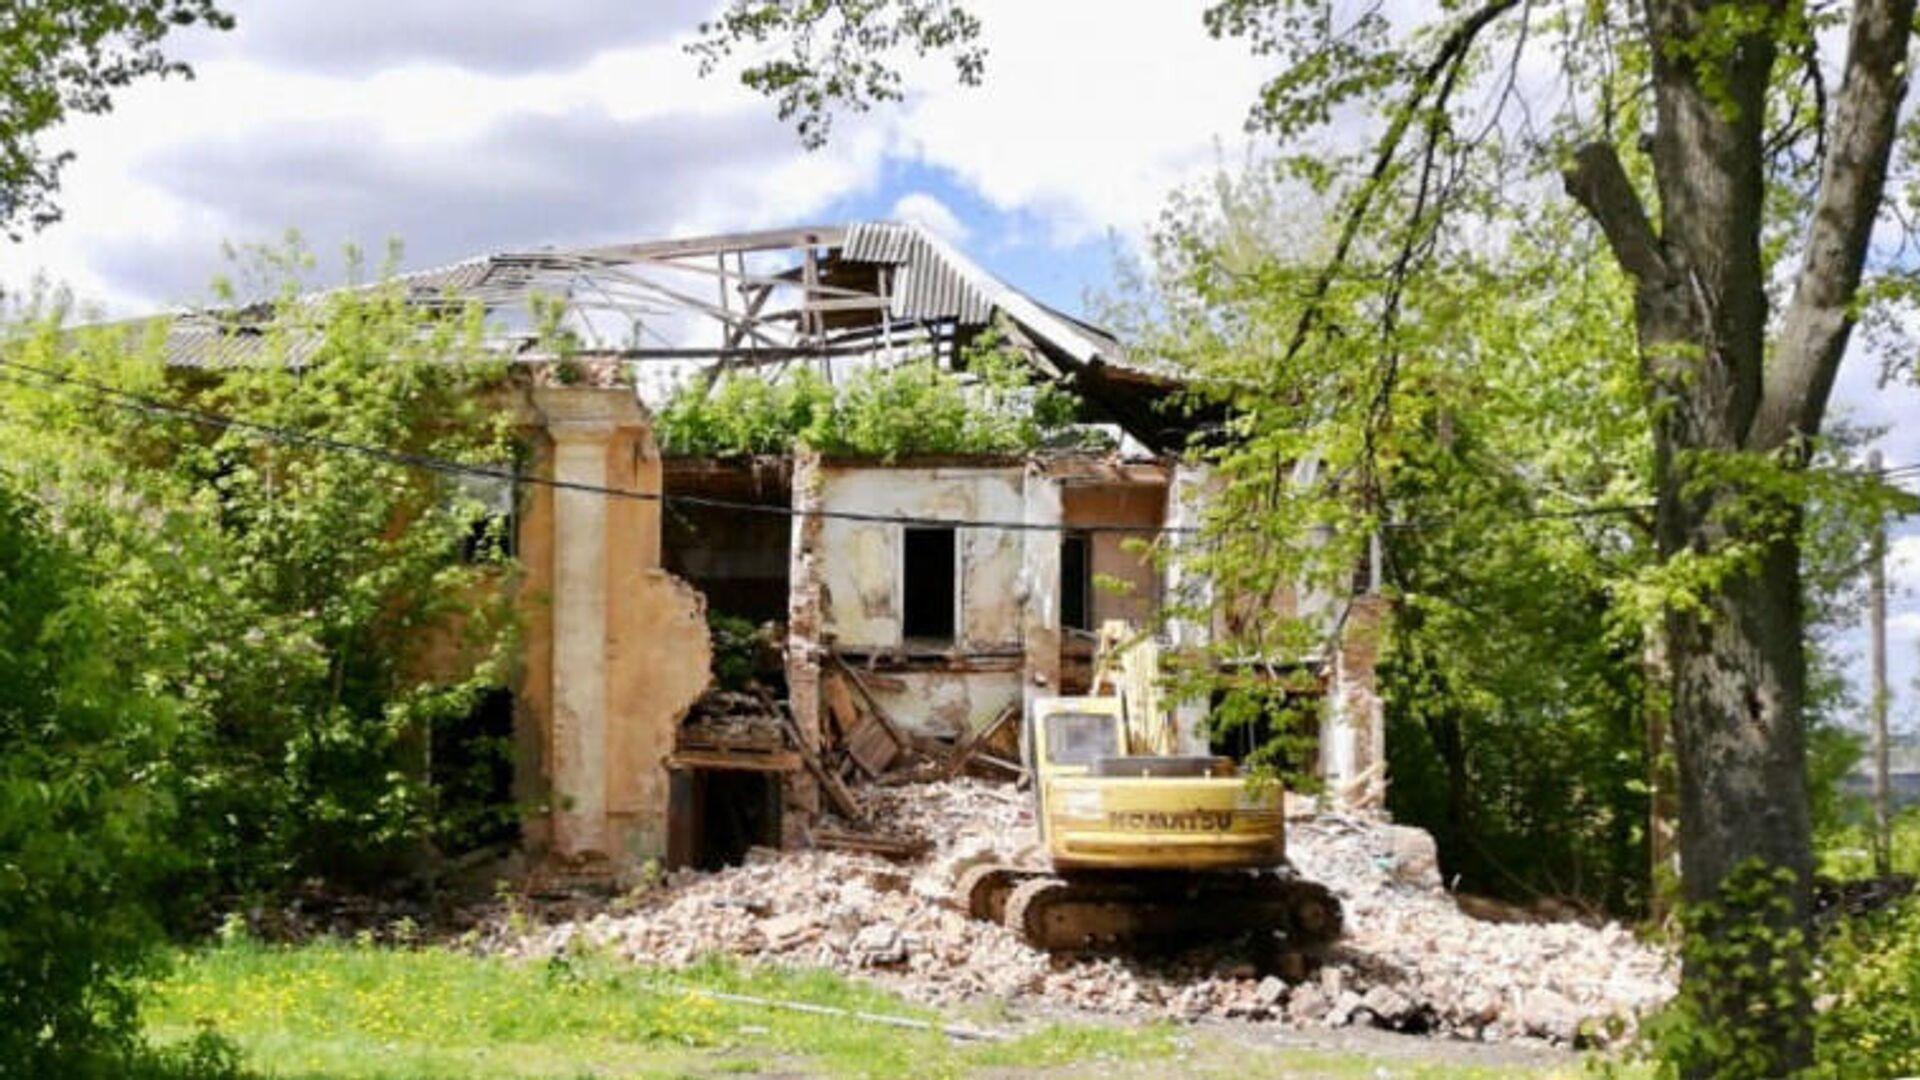 Снос аварийного дома 1951 года постройки в Кашире - РИА Новости, 1920, 16.09.2020